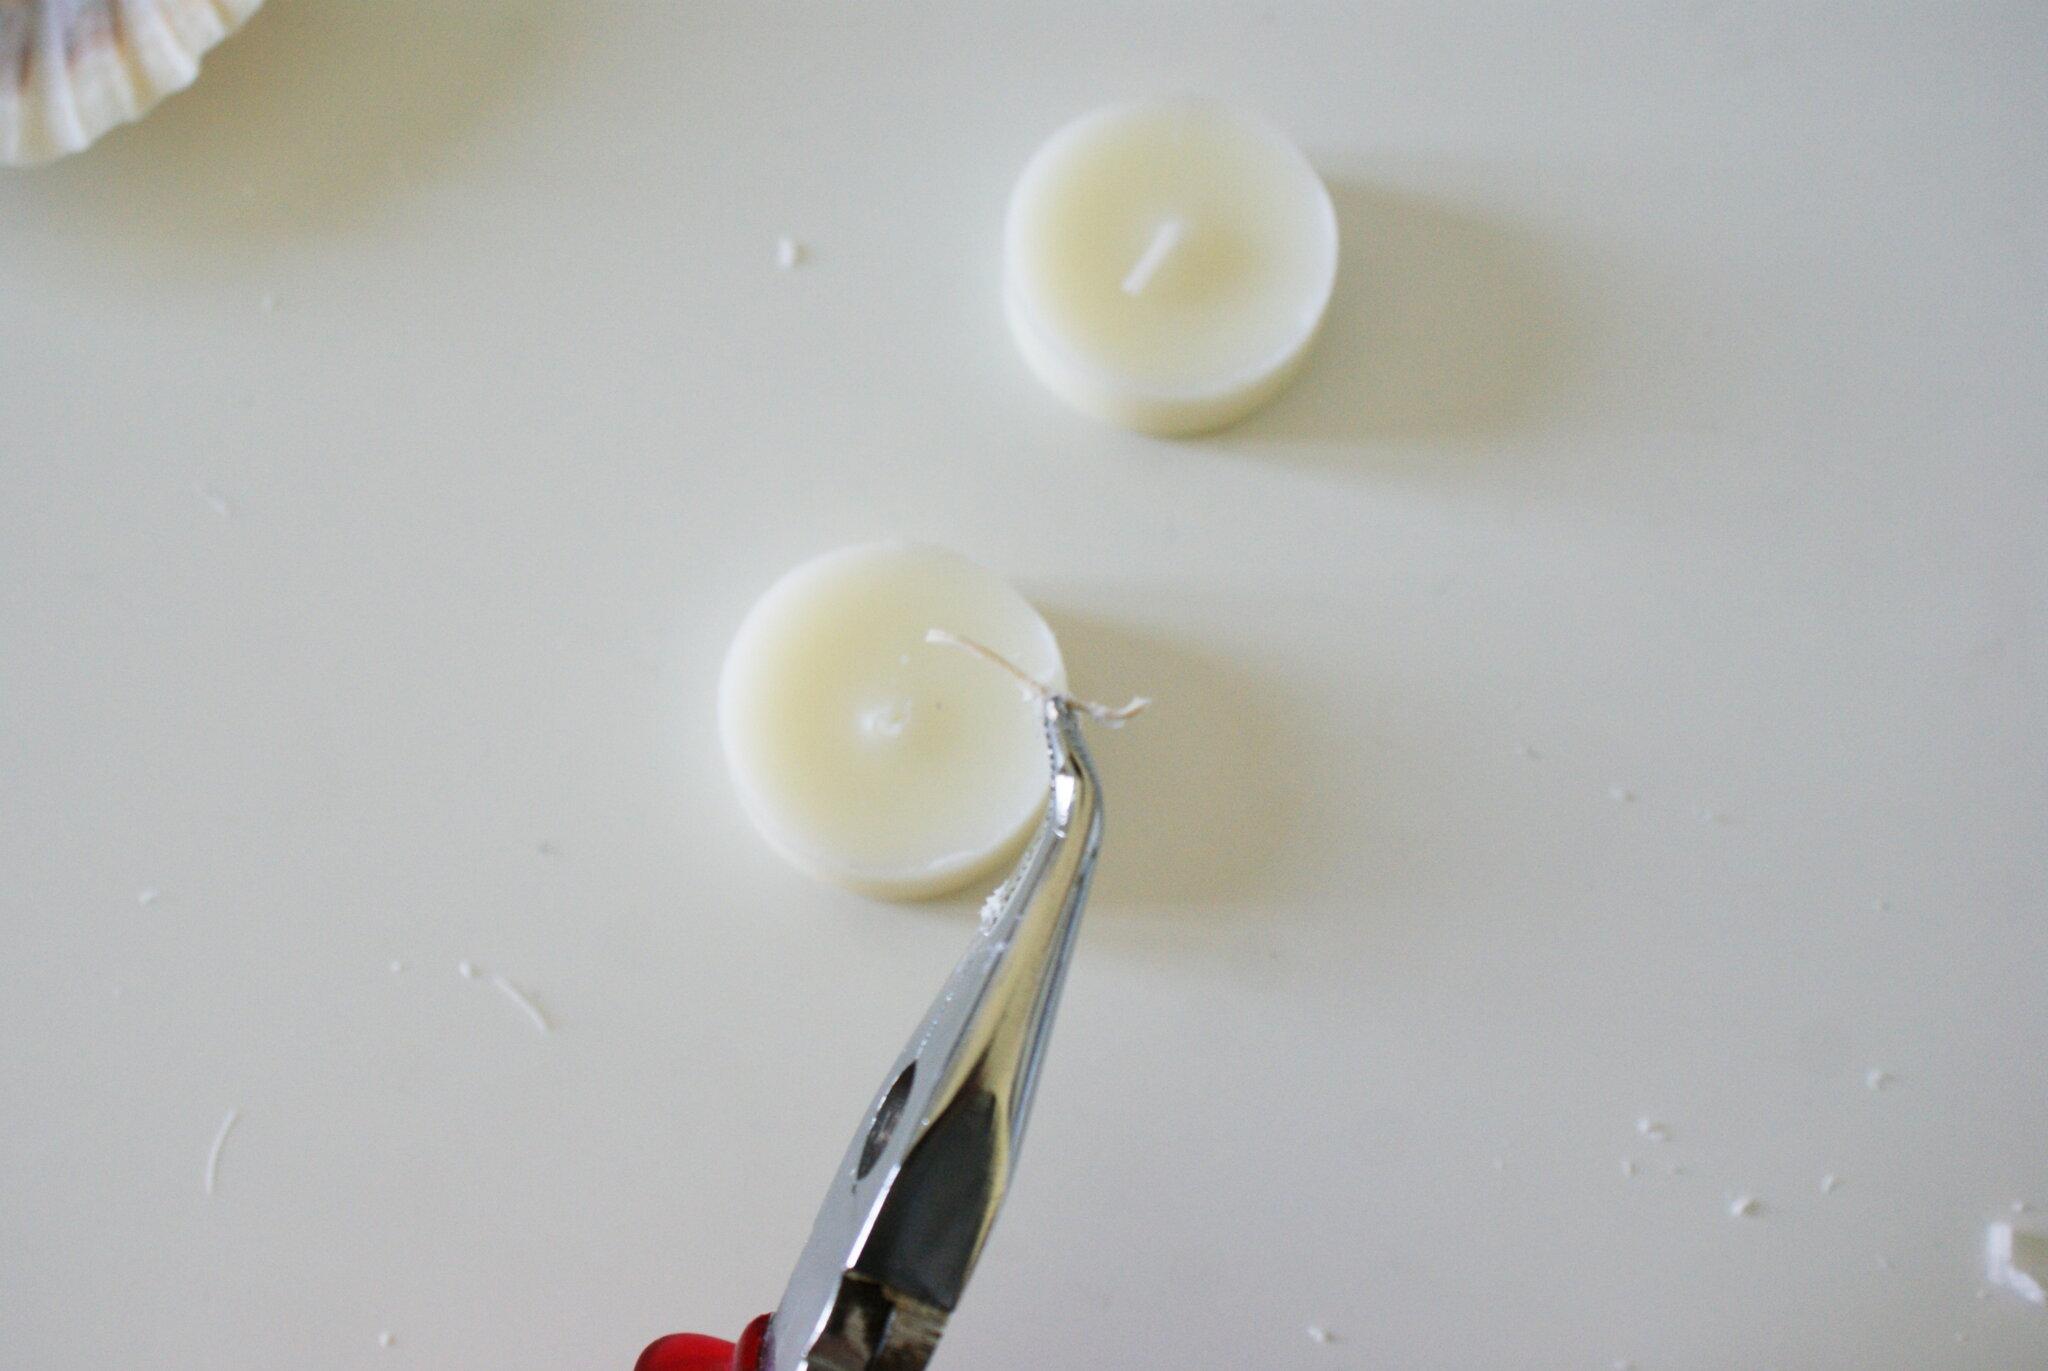 diy sea shell candles ultimate easy quick tutorial how make home decor aesthetic candele conchiglia conchiglie faidate casa come fare